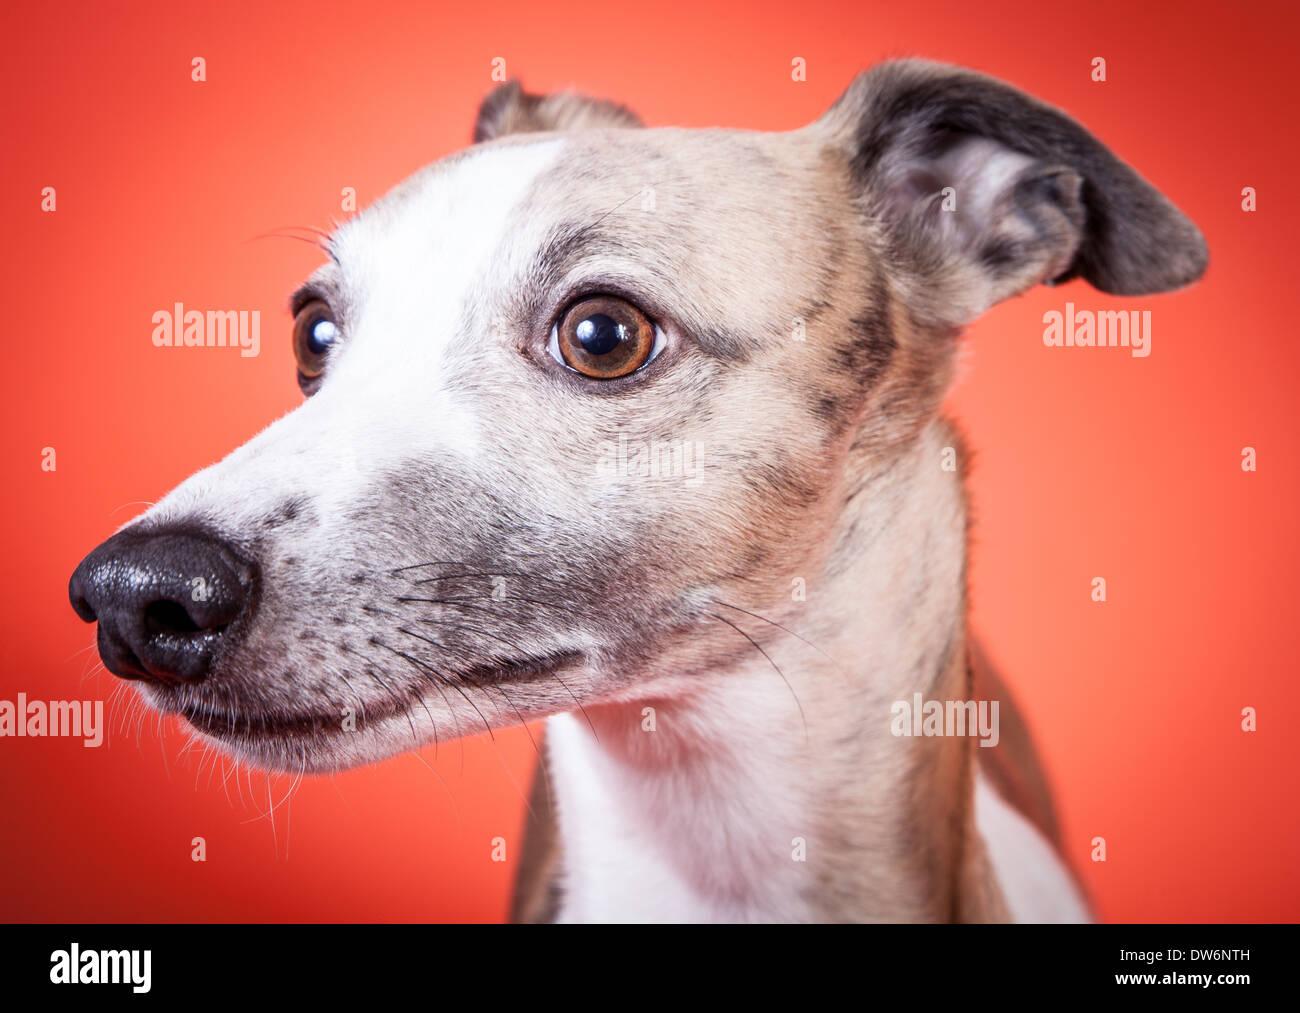 2fb88ee543632 Whippet dog portrait Stock Photo  67146369 - Alamy